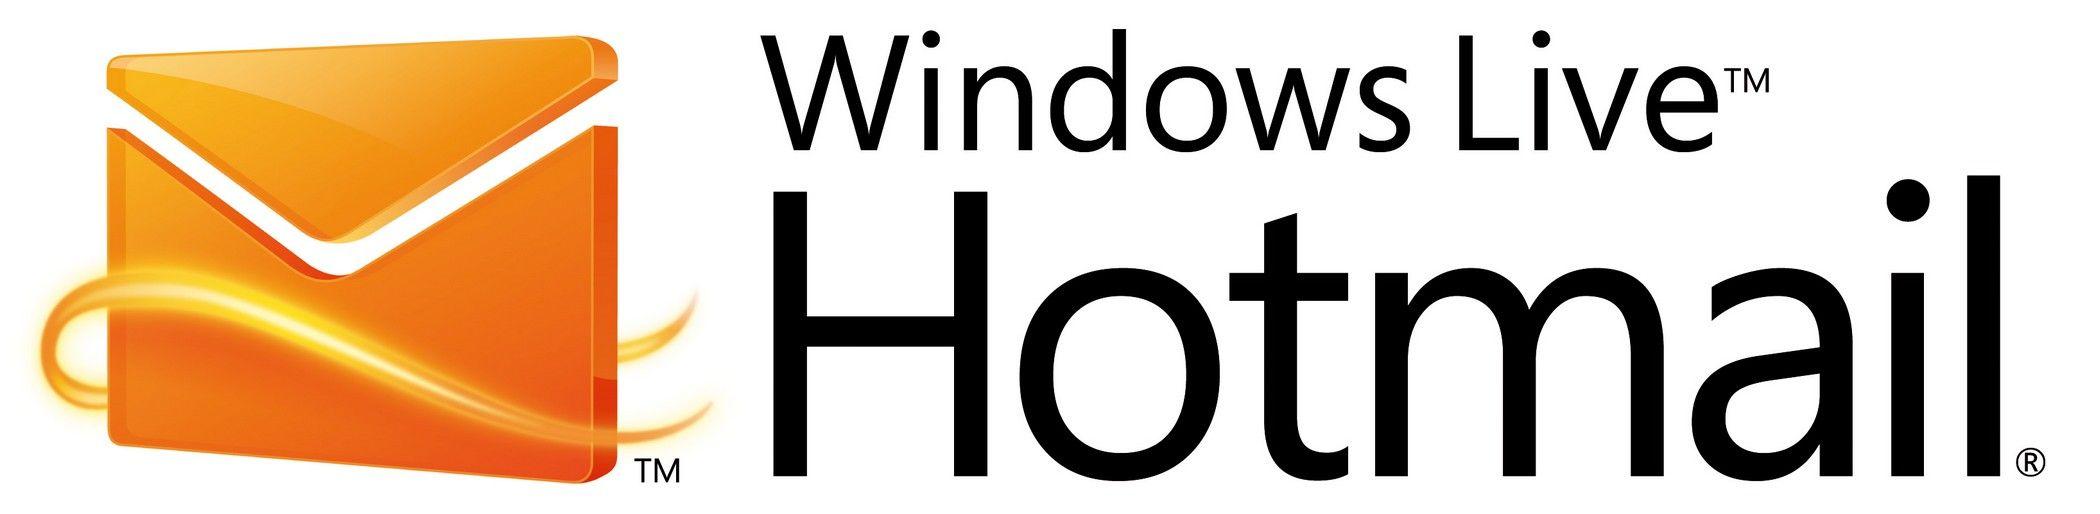 Windows Live Hotmail Logo Vector [EPS File]